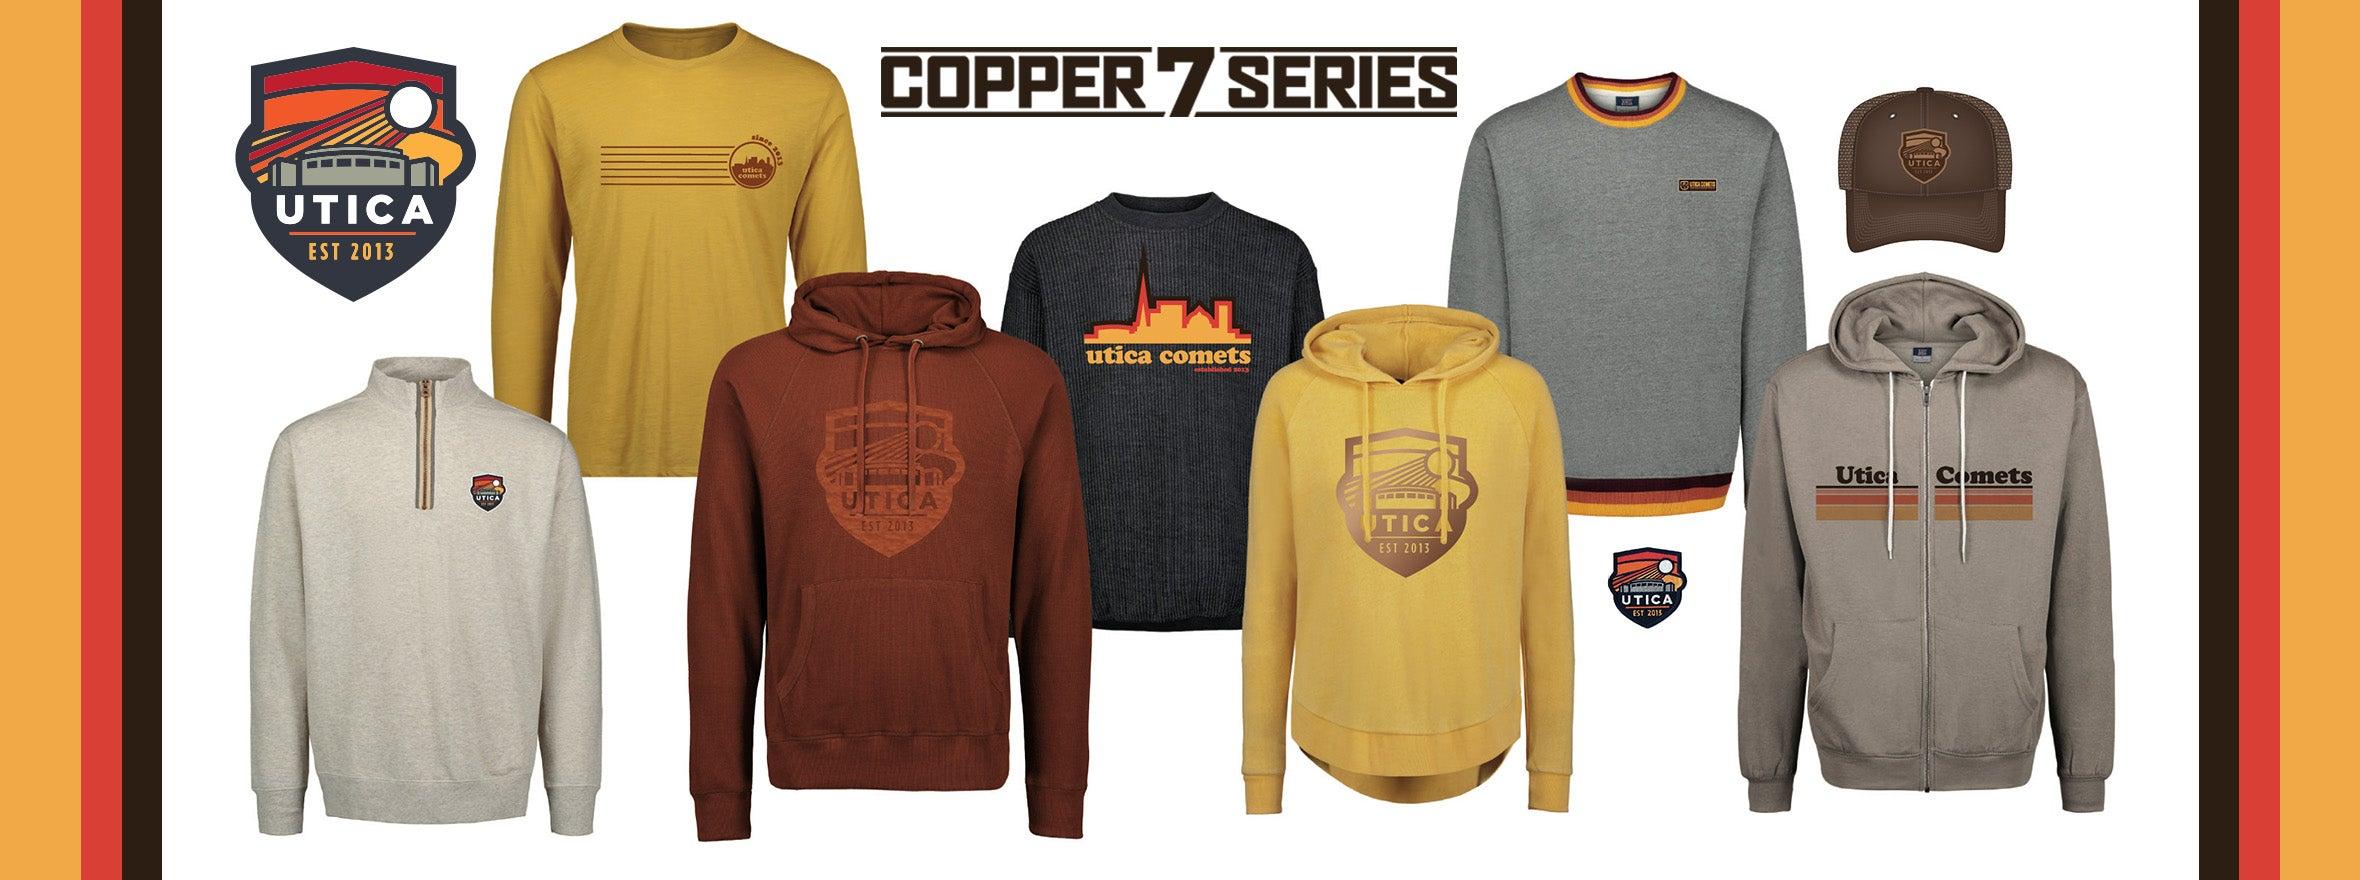 COMETS UNVEIL COPPER 7 SERIES CAPSULE COLLECTION